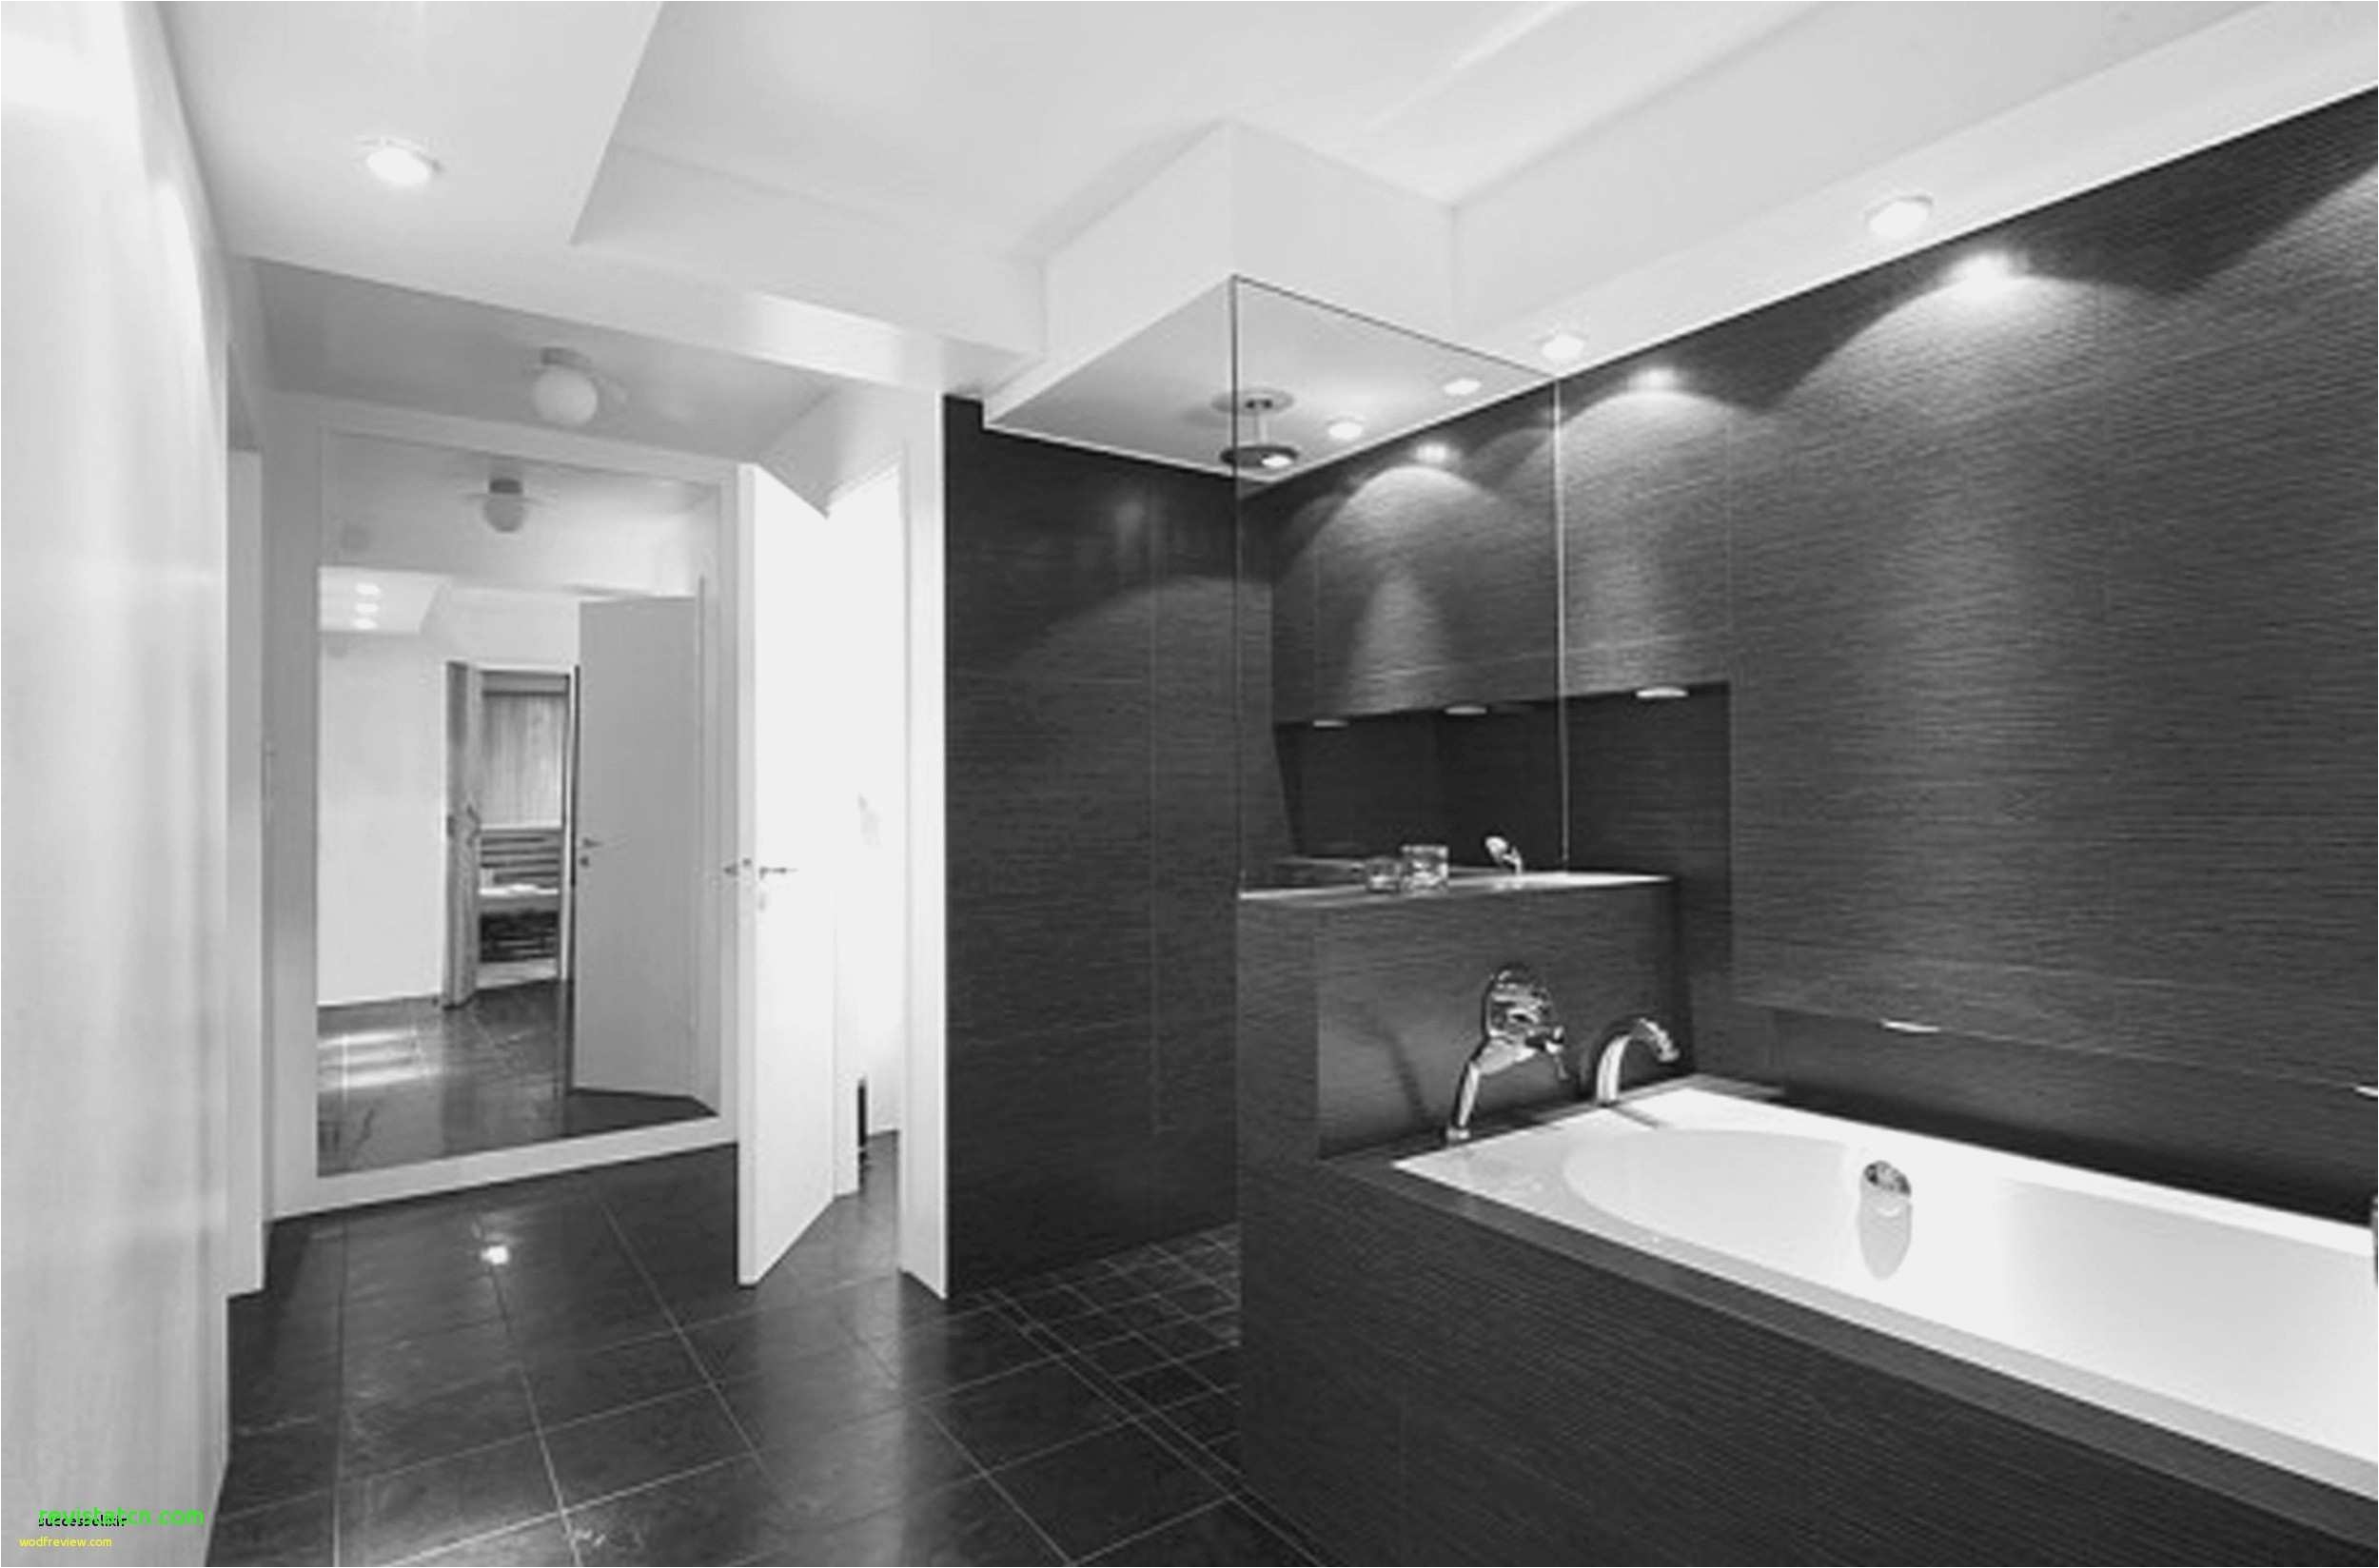 Uk Bathroom Design Ideas Pertaining to Your Home 35 Amazing Bathroom Tiles Ideas Uk Decoration